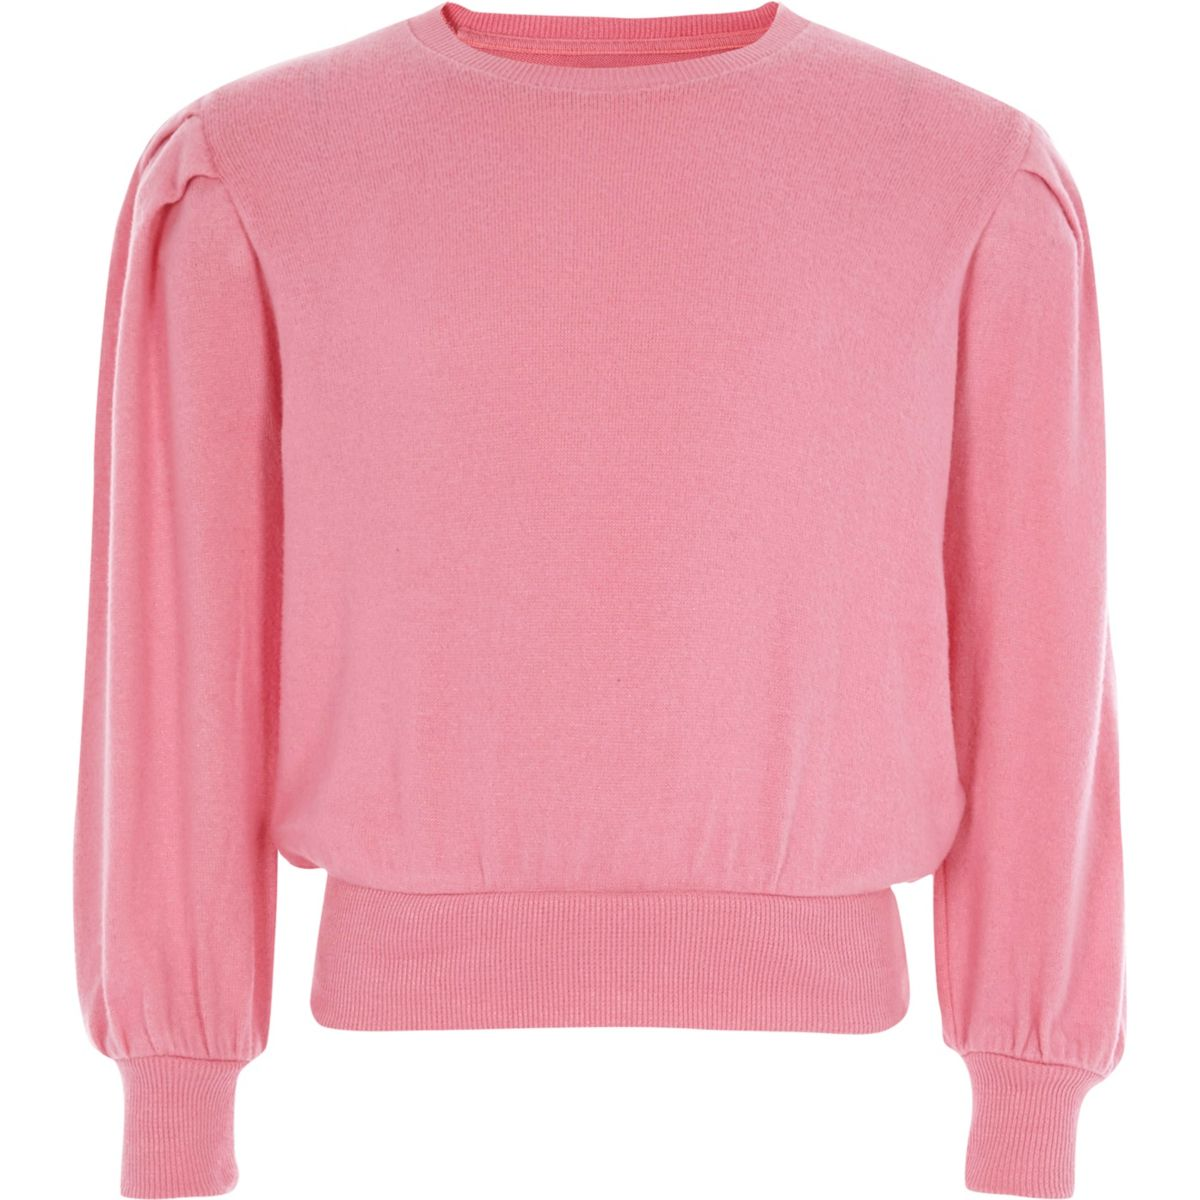 Girls pink puff long sleeve sweater